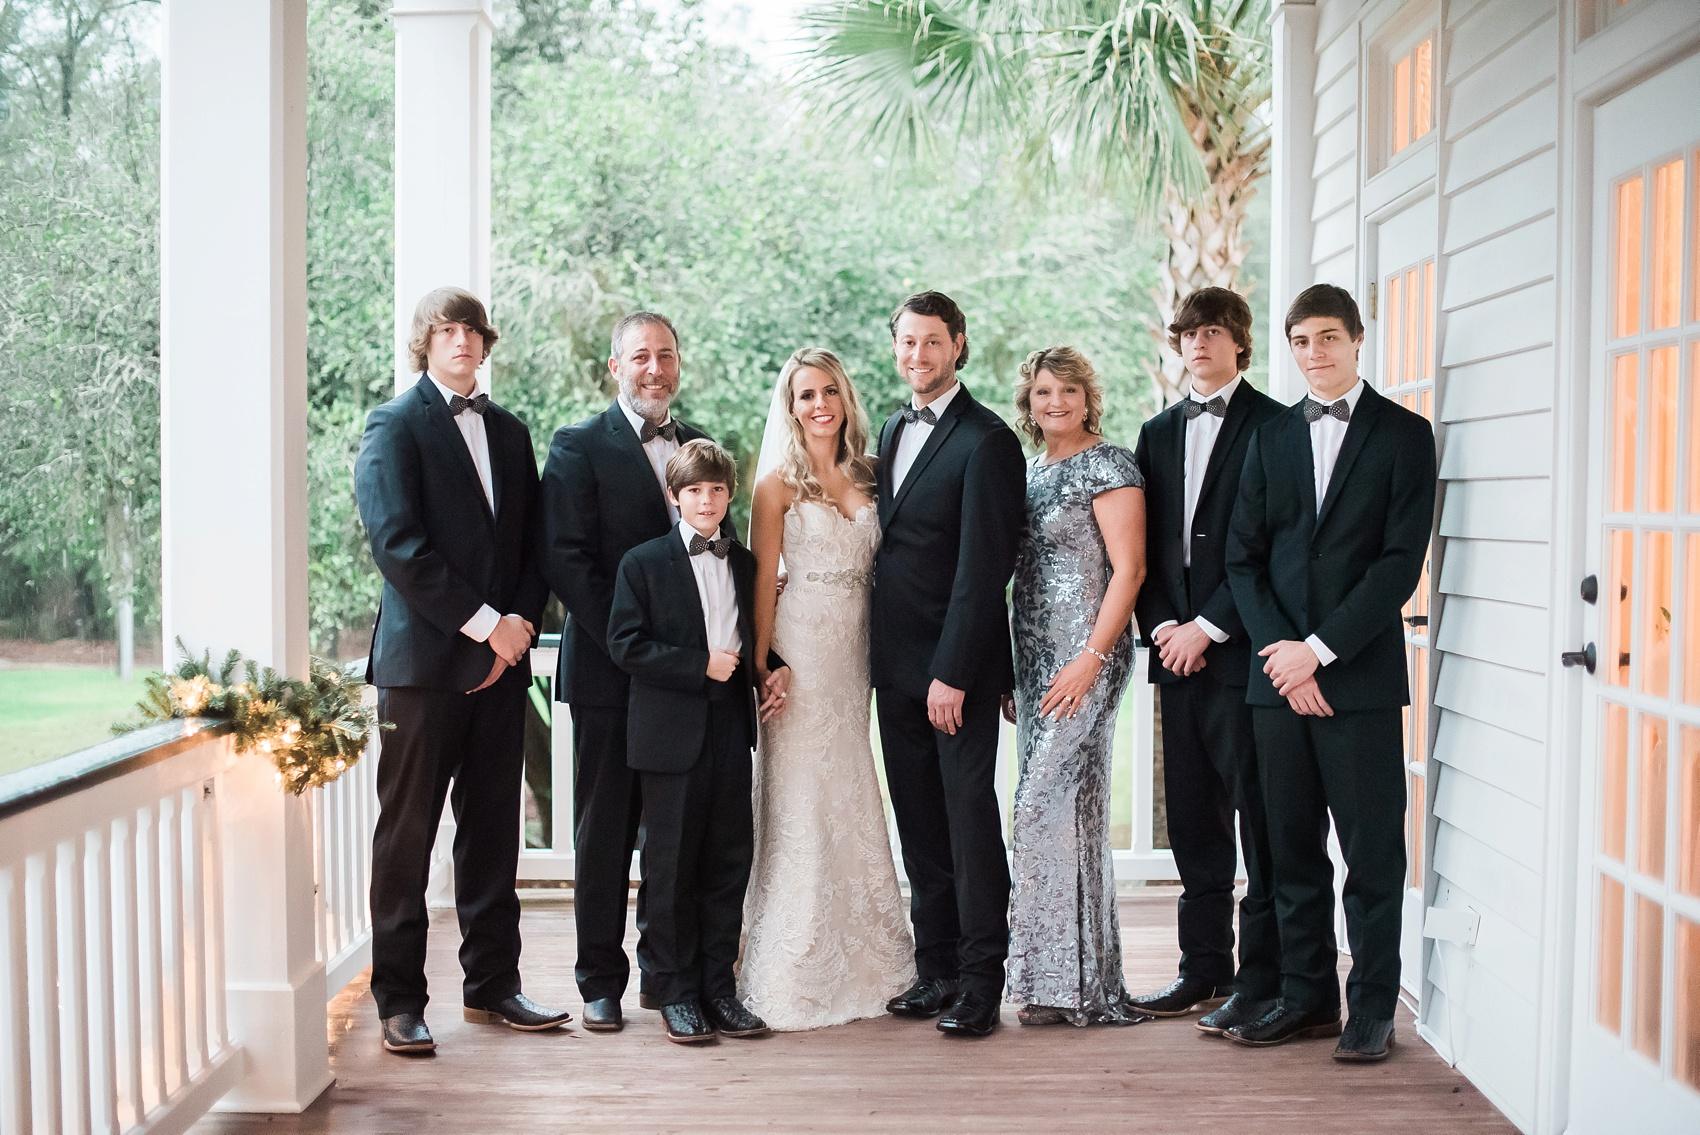 South_carolina_wedding_photographer_0147.jpg